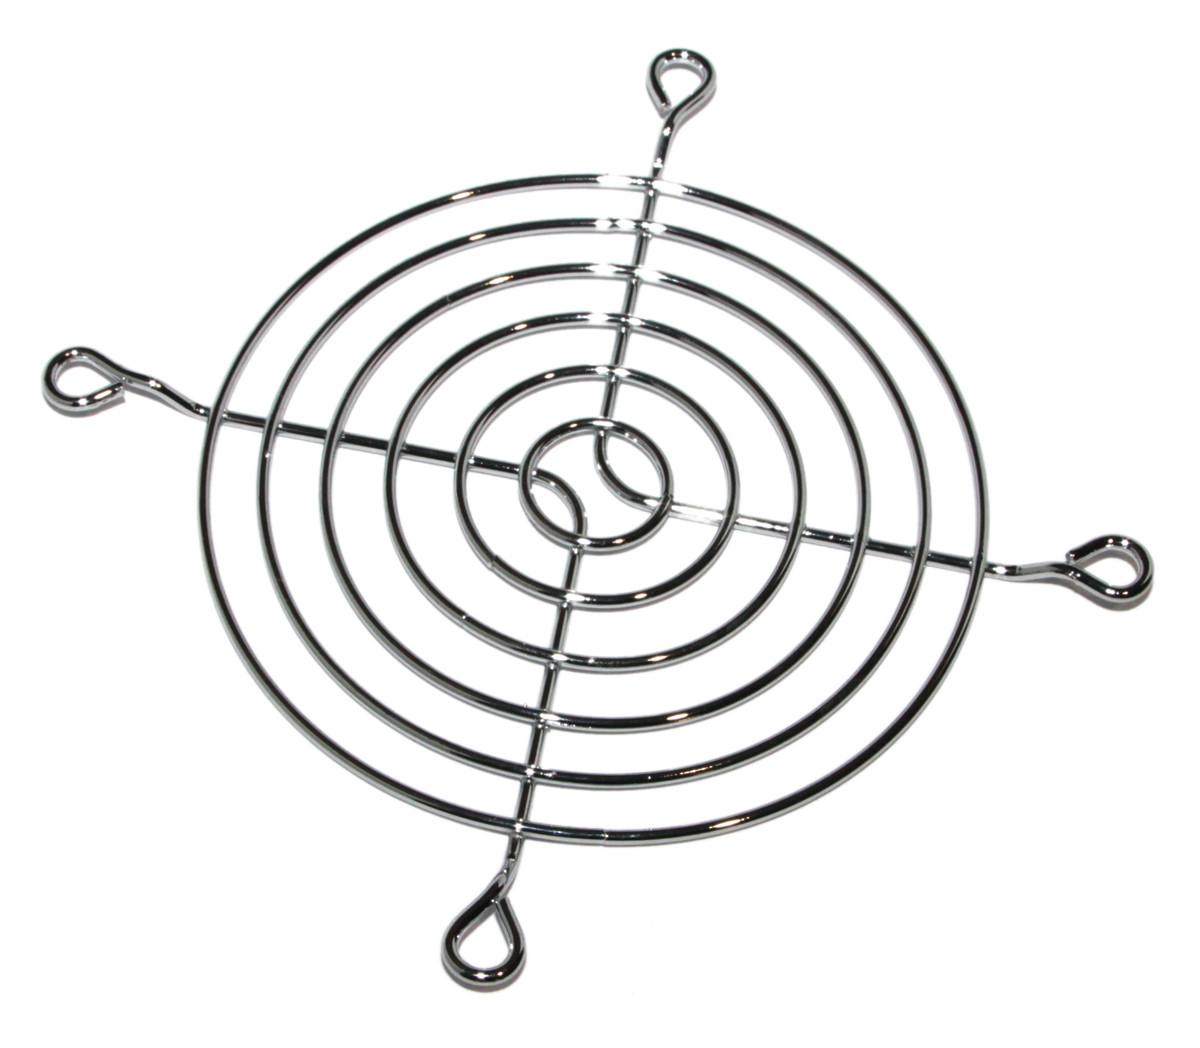 Решетка для вентиляторов 92mm, Merlion Silver